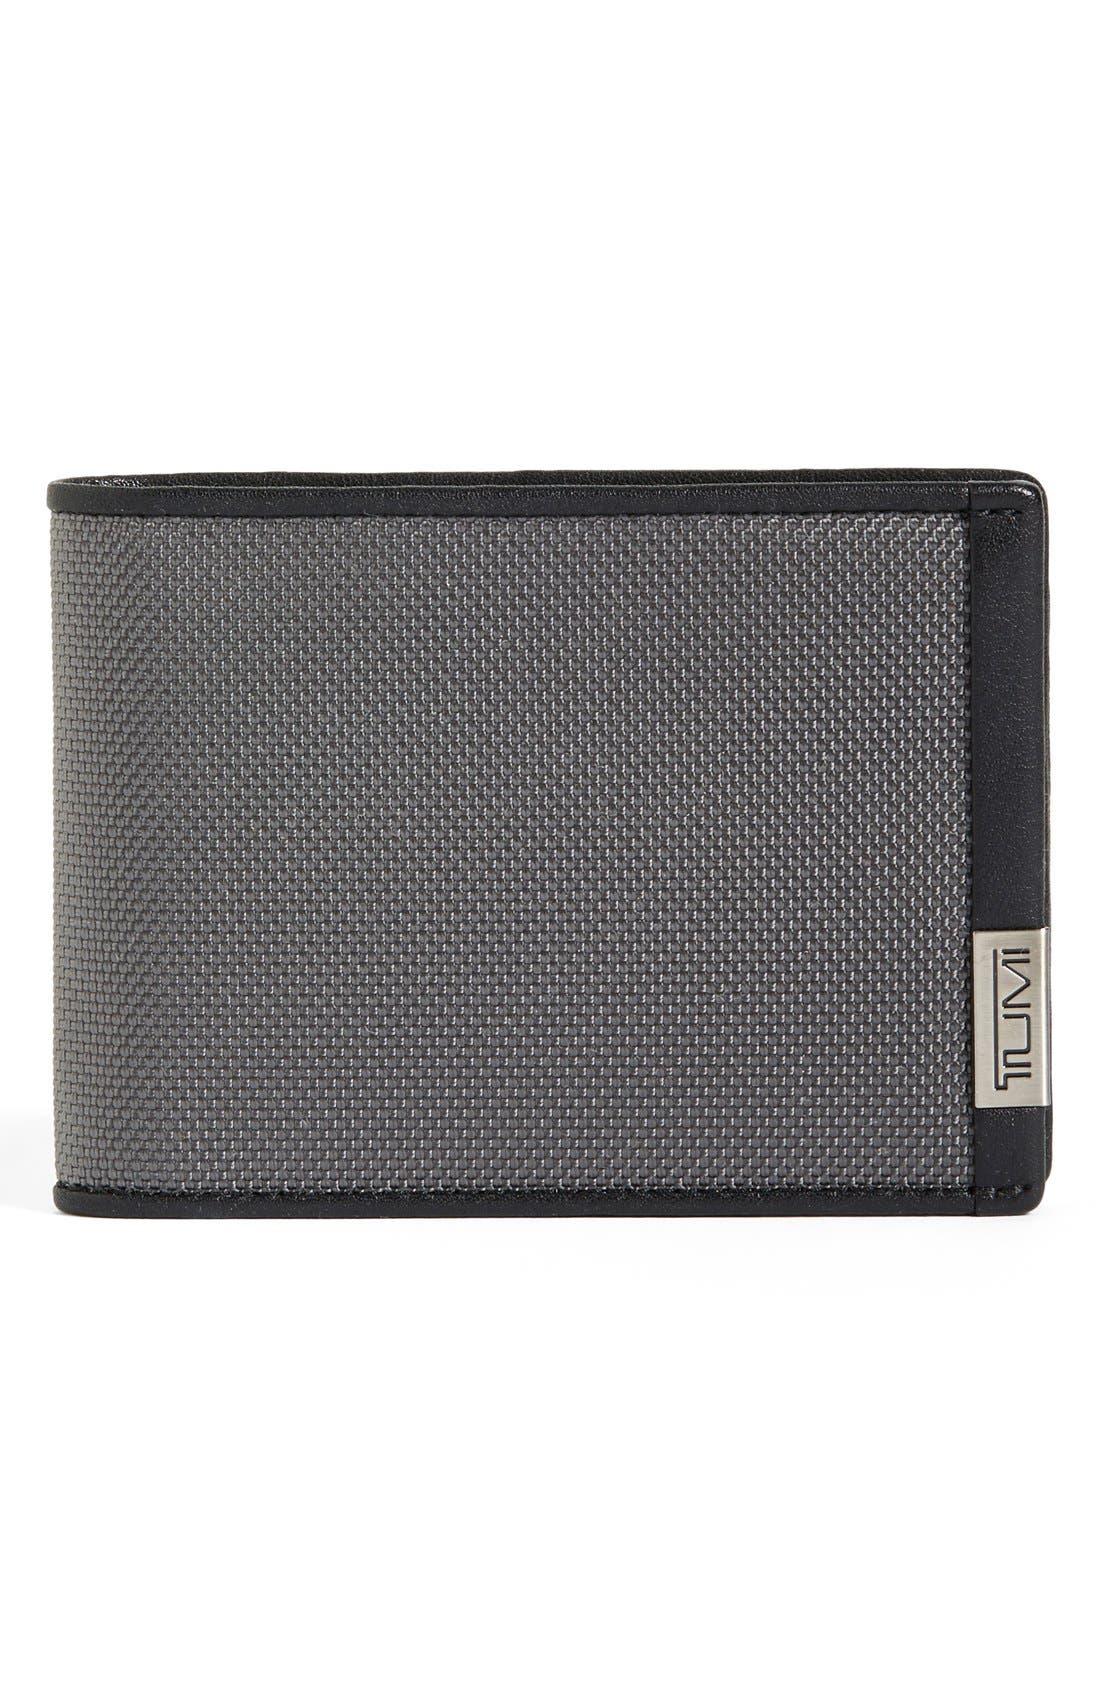 Alpha Ballistic Nylon Wallet, Main, color, 034